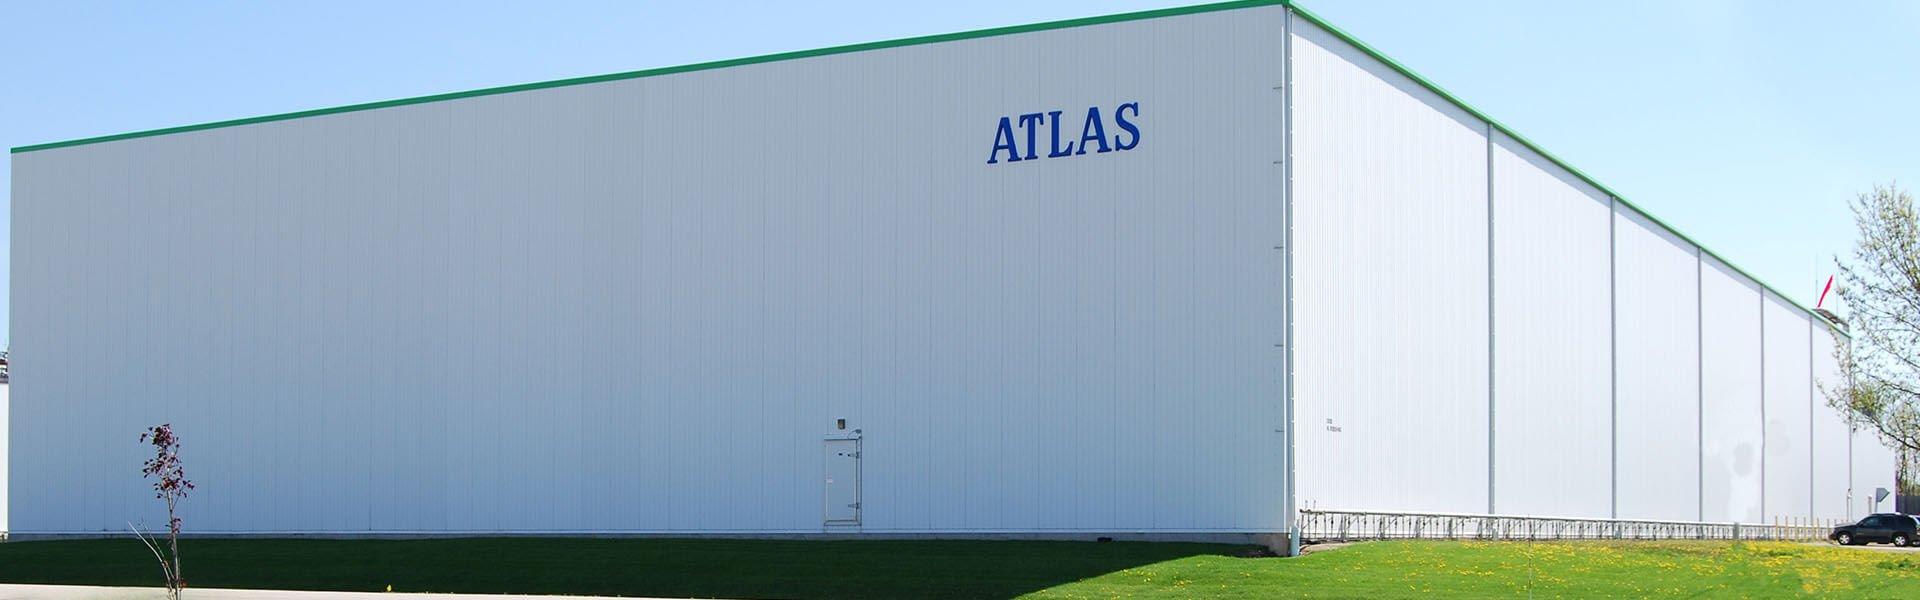 immel-banner_Atlas Cold Storage